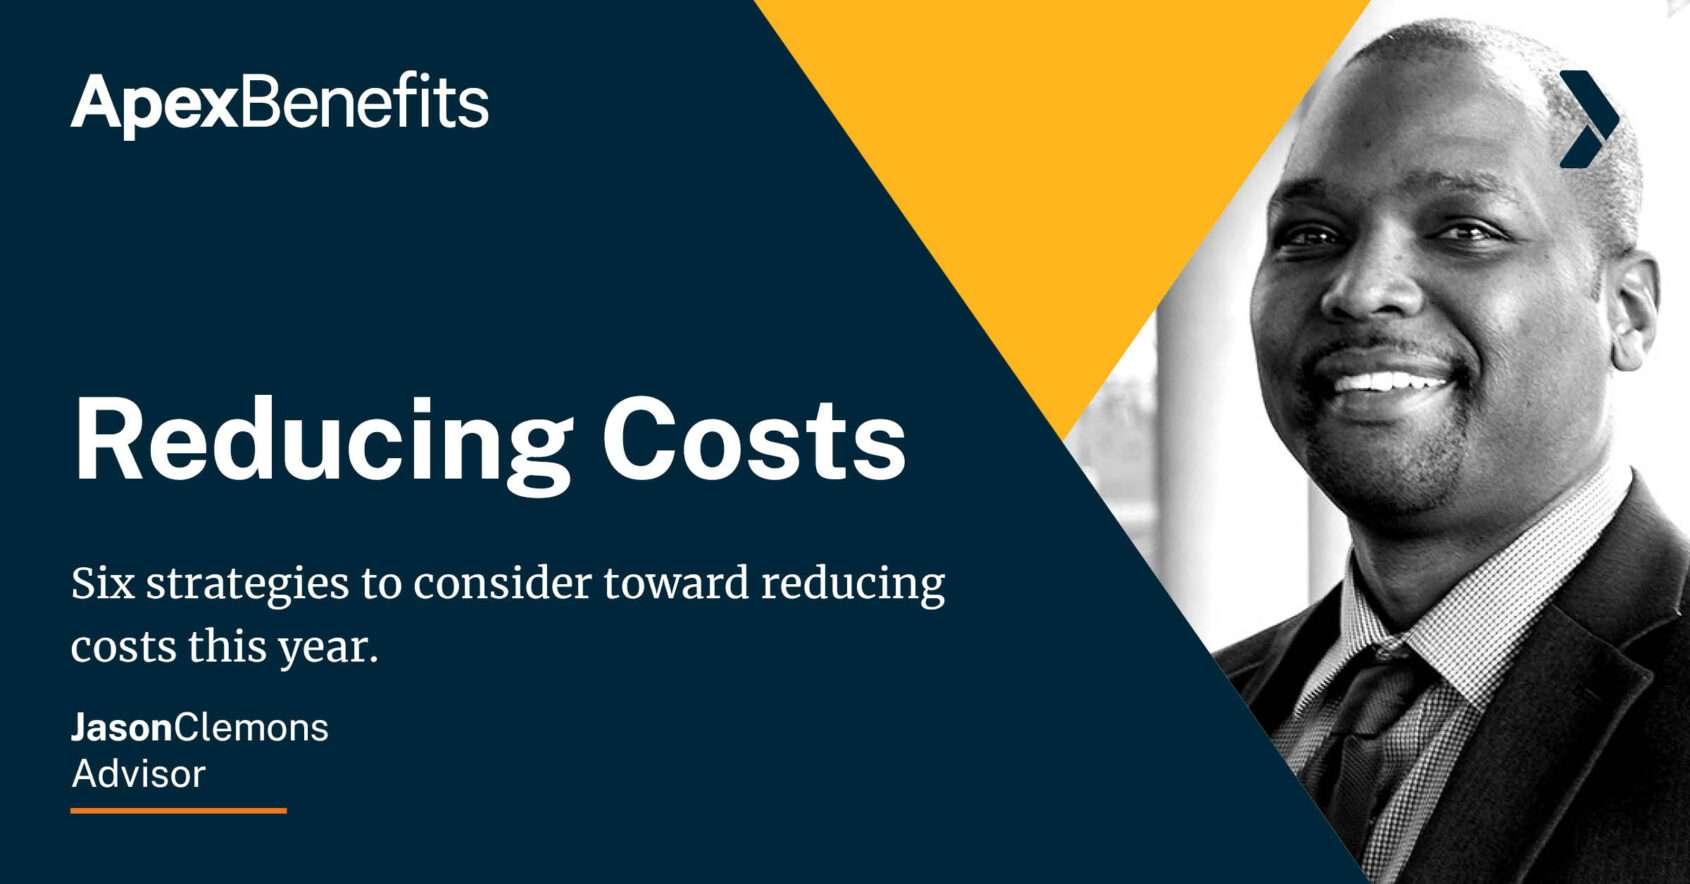 Jason Reduce Costs